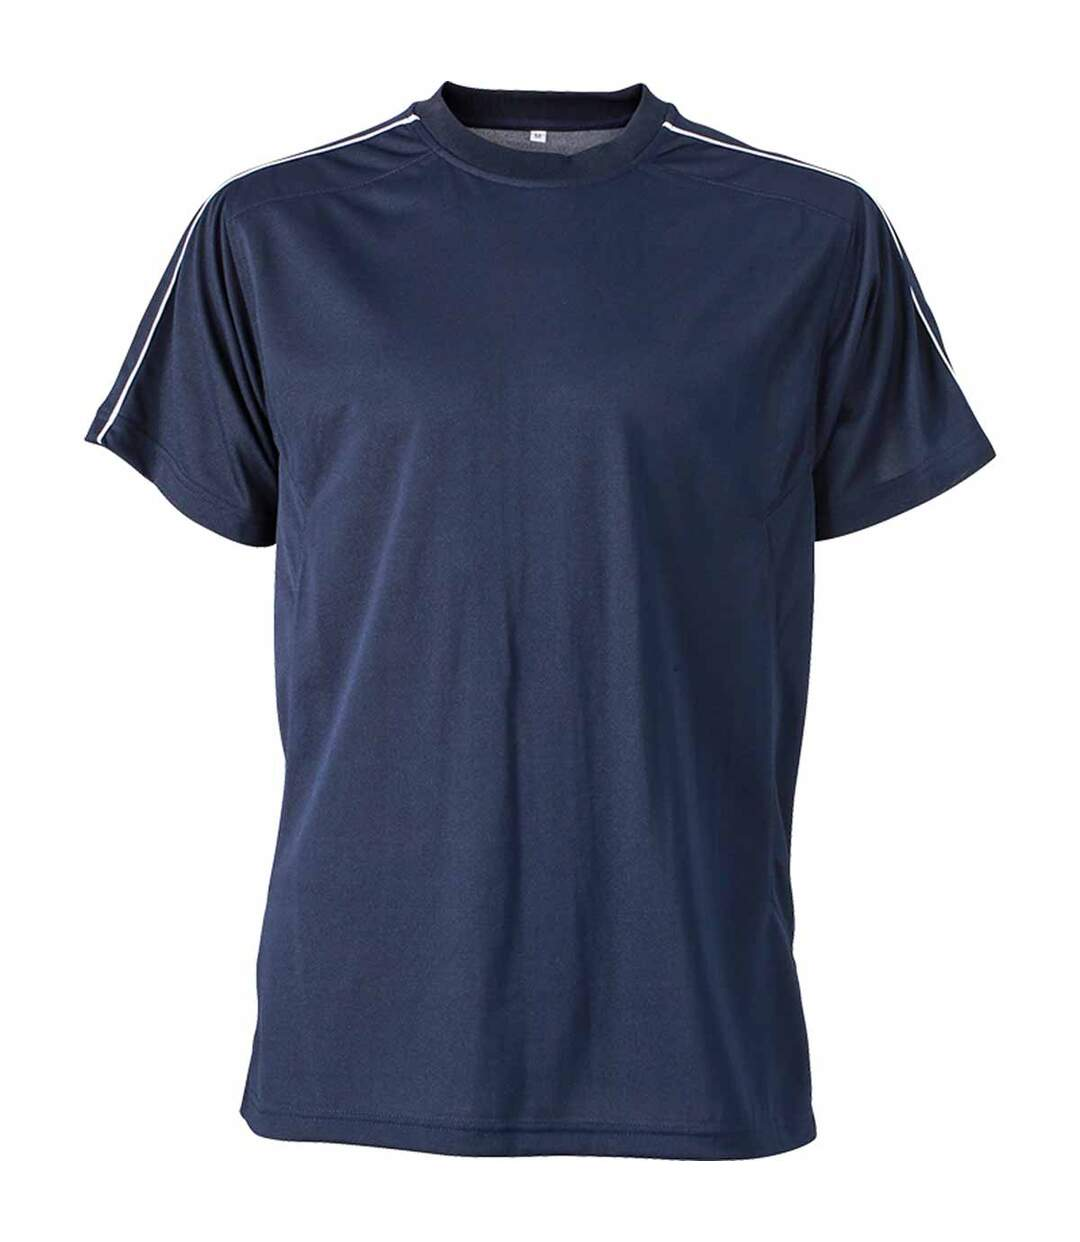 T-shirt artisan anti-bactérien anti-statique - JN827 - bleu marine